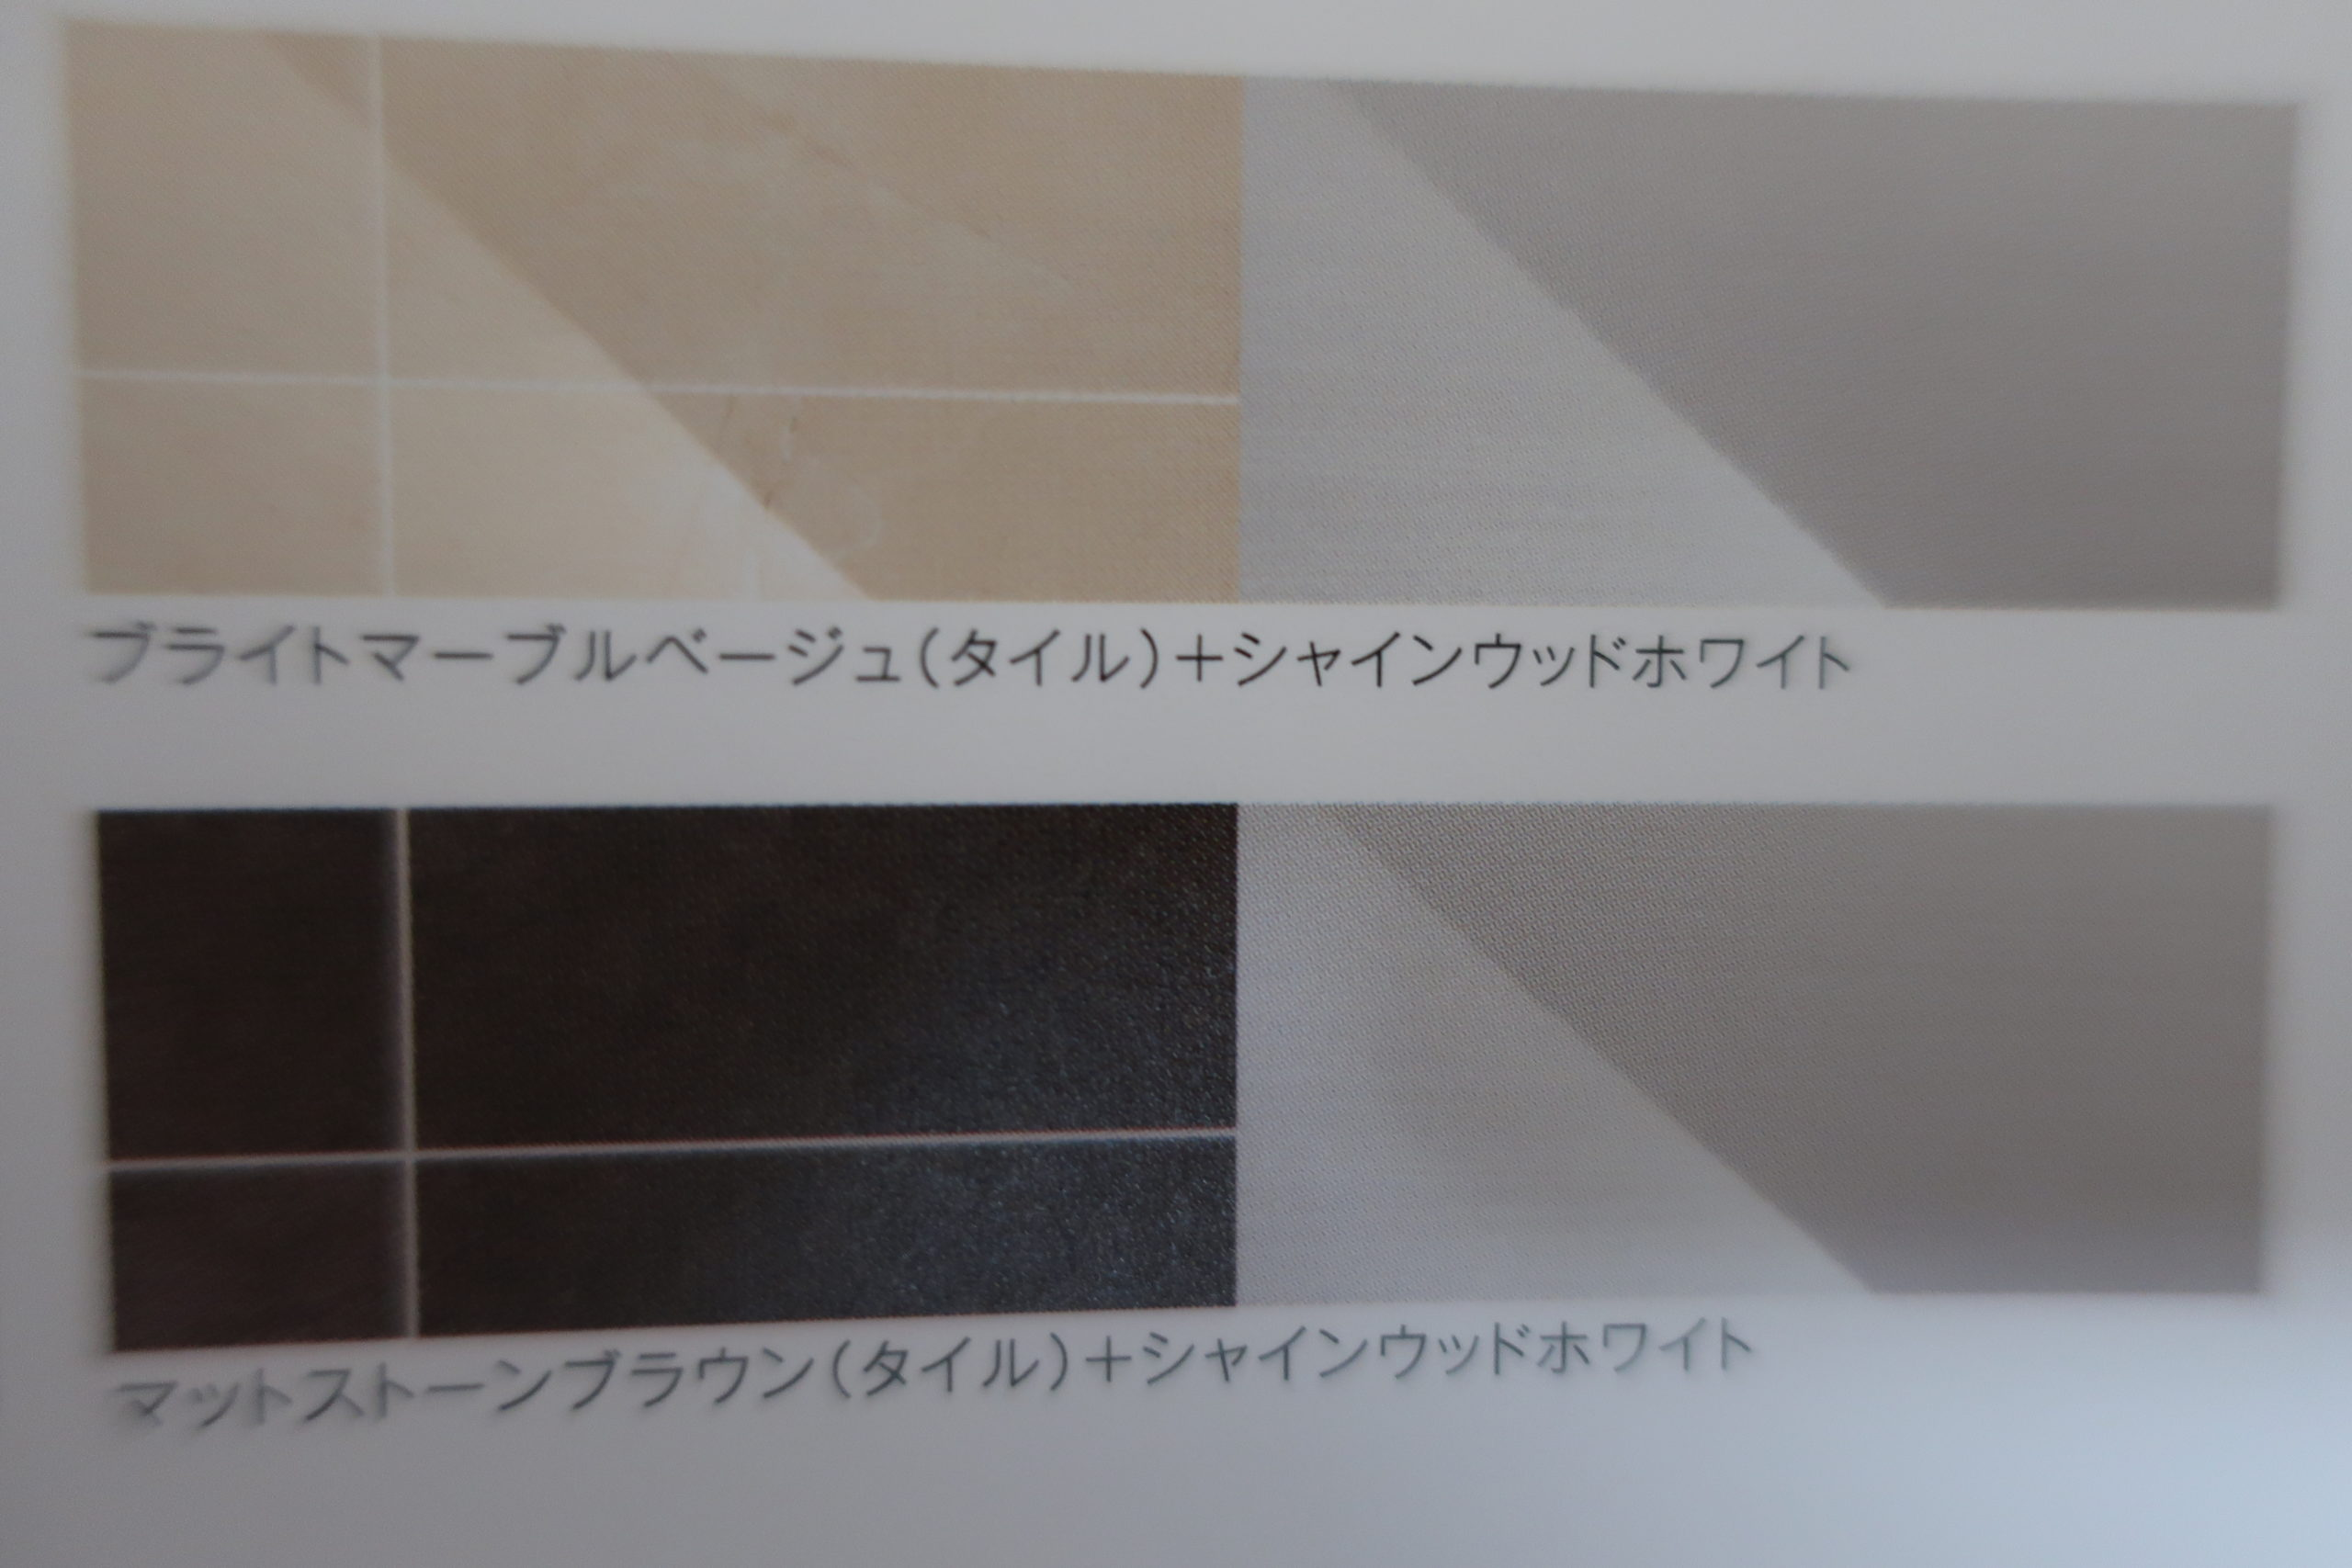 LEIBシリーズ特徴3